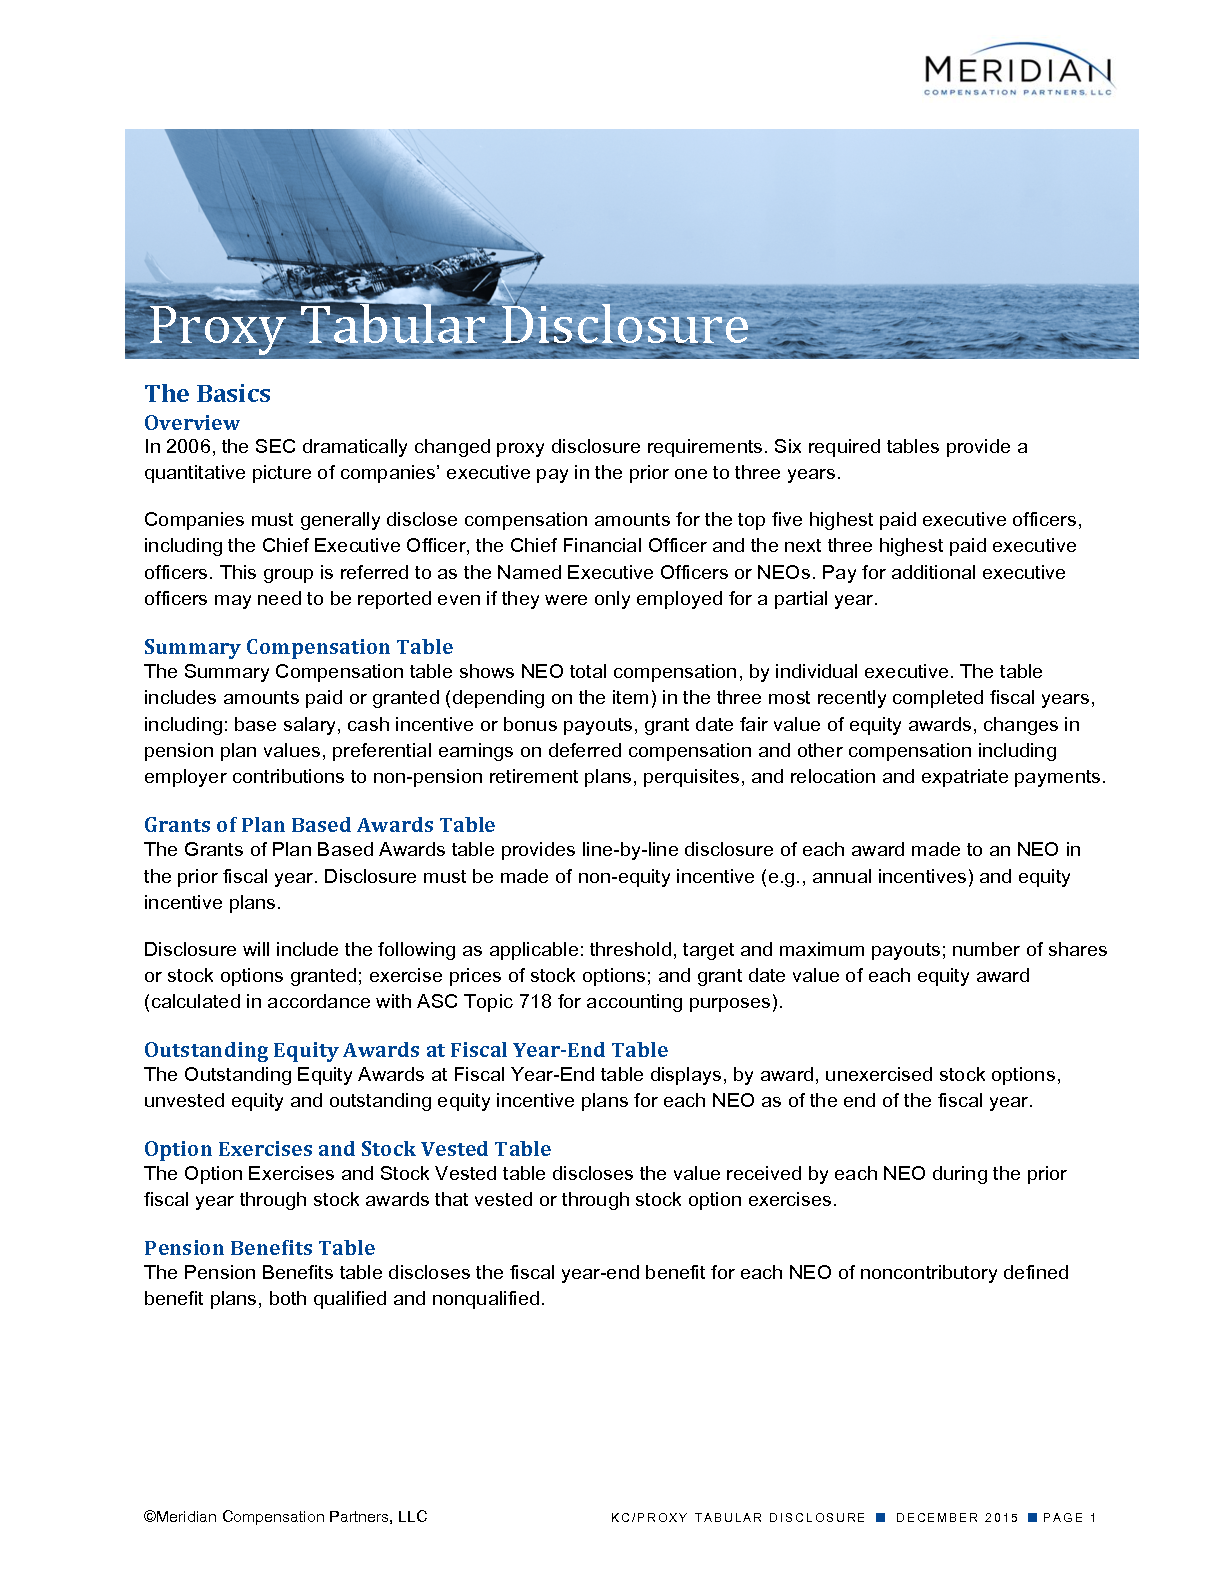 proxy tabular disclosure meridian compensation partners llc proxy tabular disclosure pdf